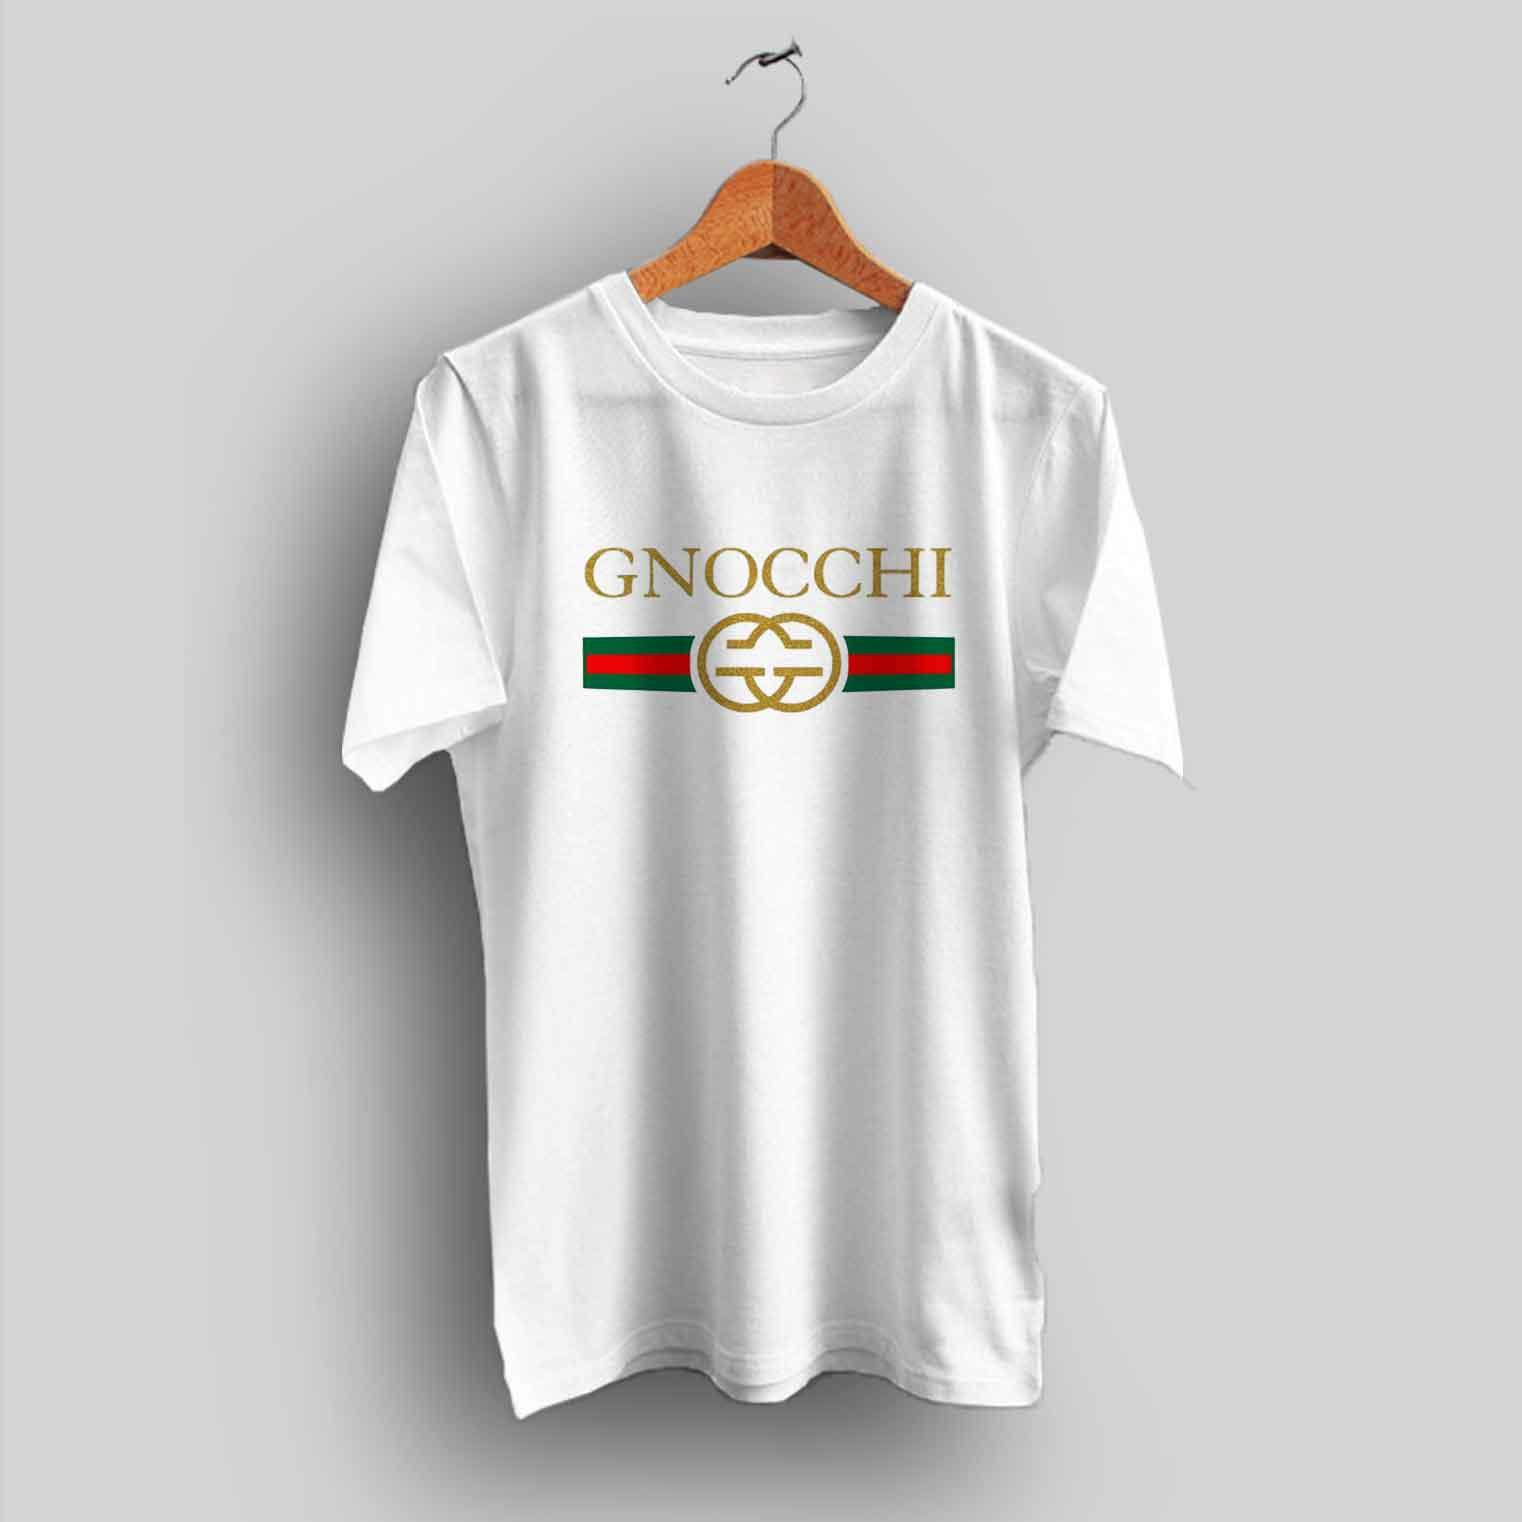 For Sale Gnocchi Vintage GC Parody T Shirt Cheap Urban Clothing.